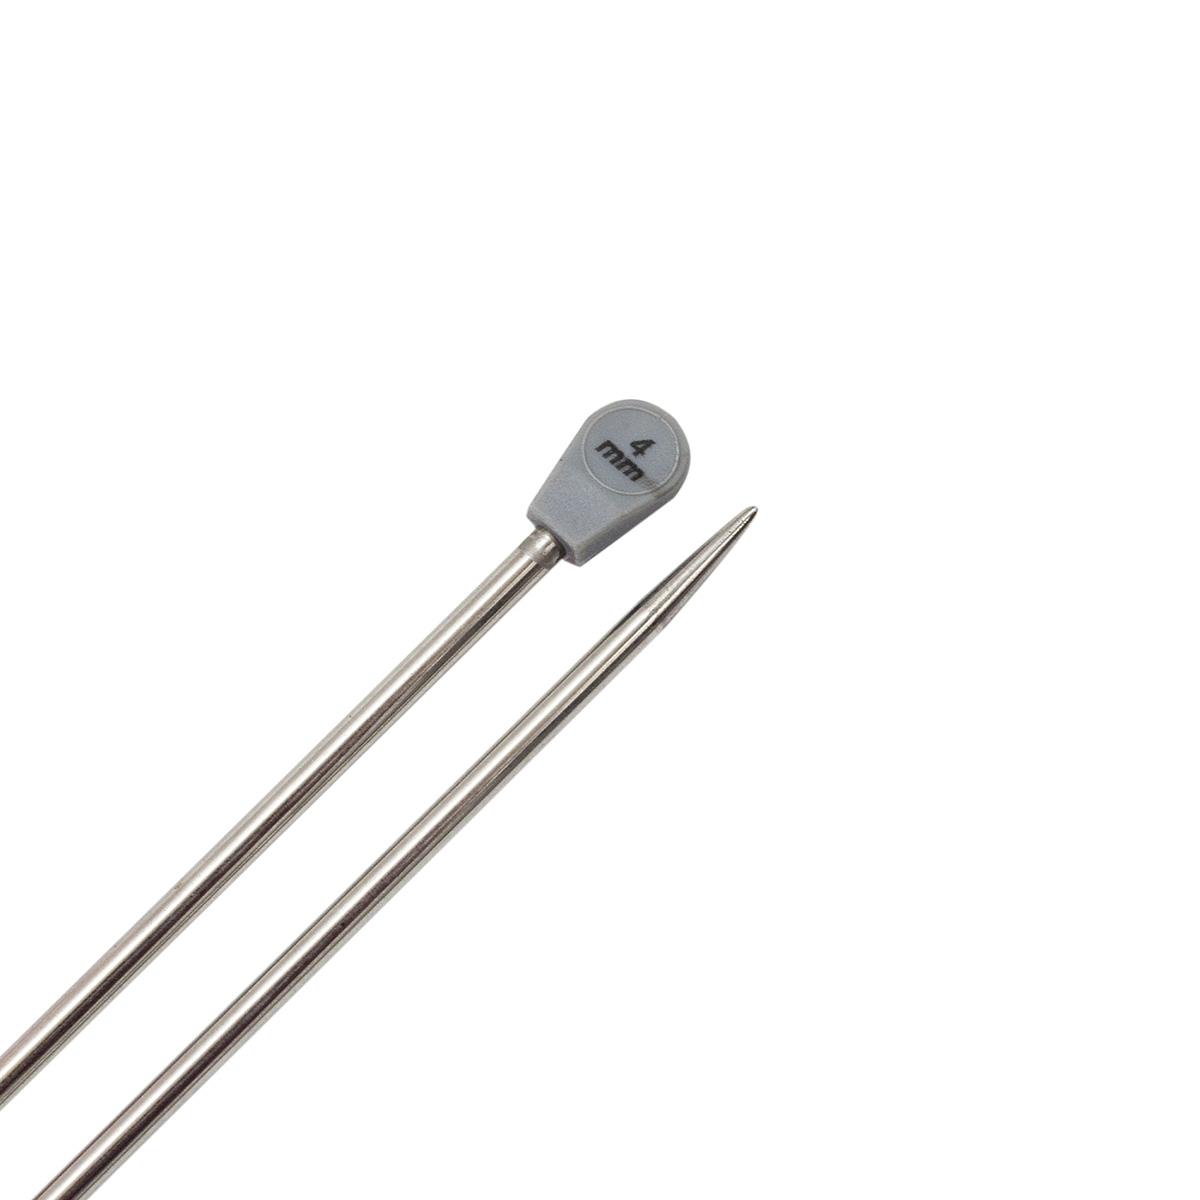 Спицы прямые металл 941240, 35 см, 4,0 мм, Hobby&Pro